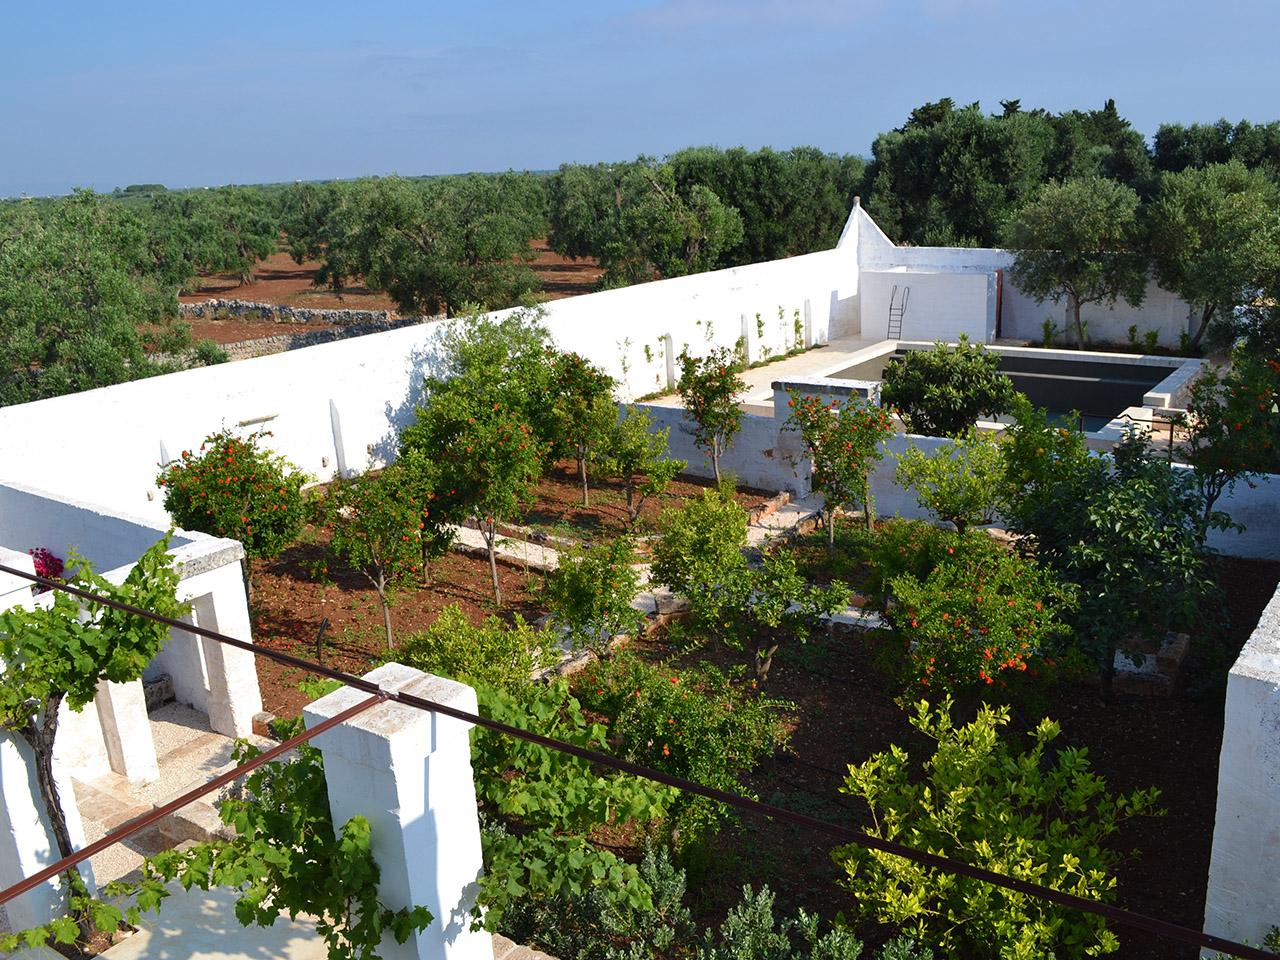 costruzioni restauri sirio ostuni restauro ristrutturazione masseria olive nardo ostuni dsc 5097